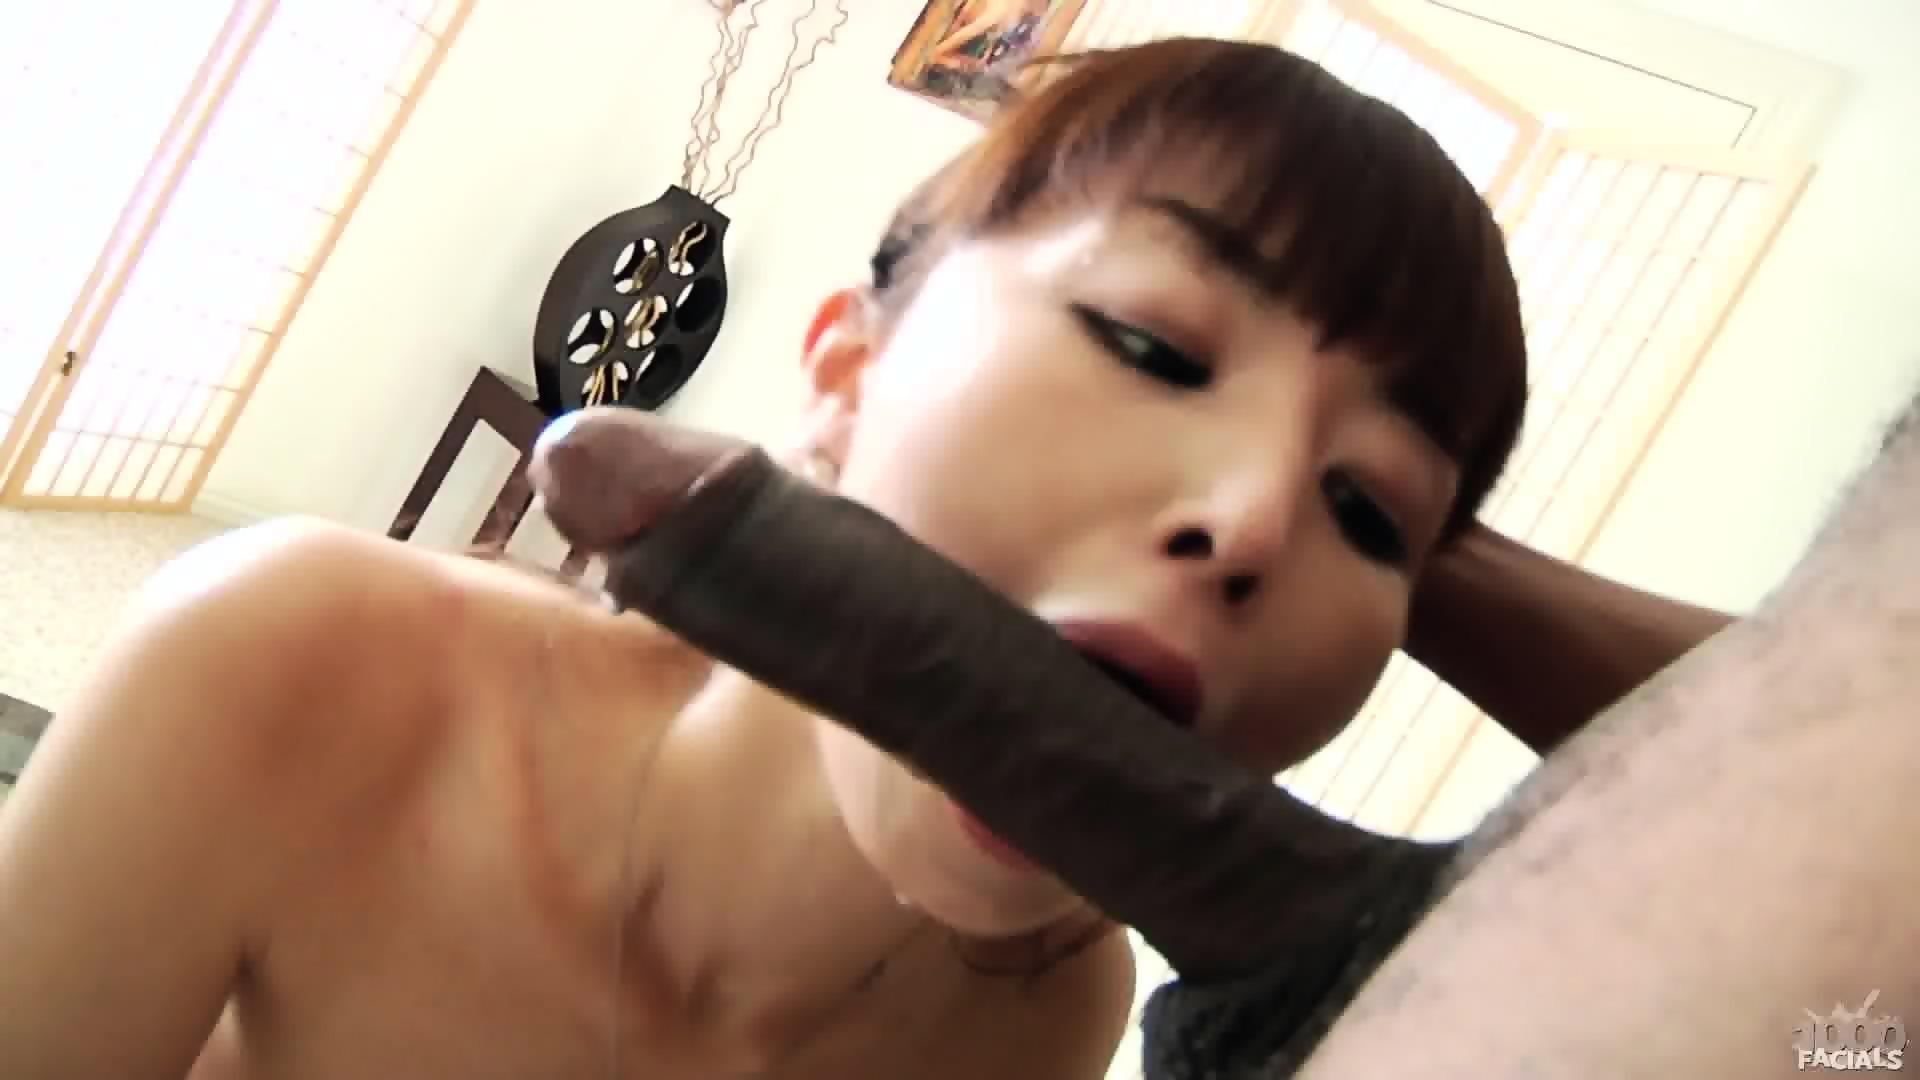 Naked Girls 18+ Lu sio su hentai